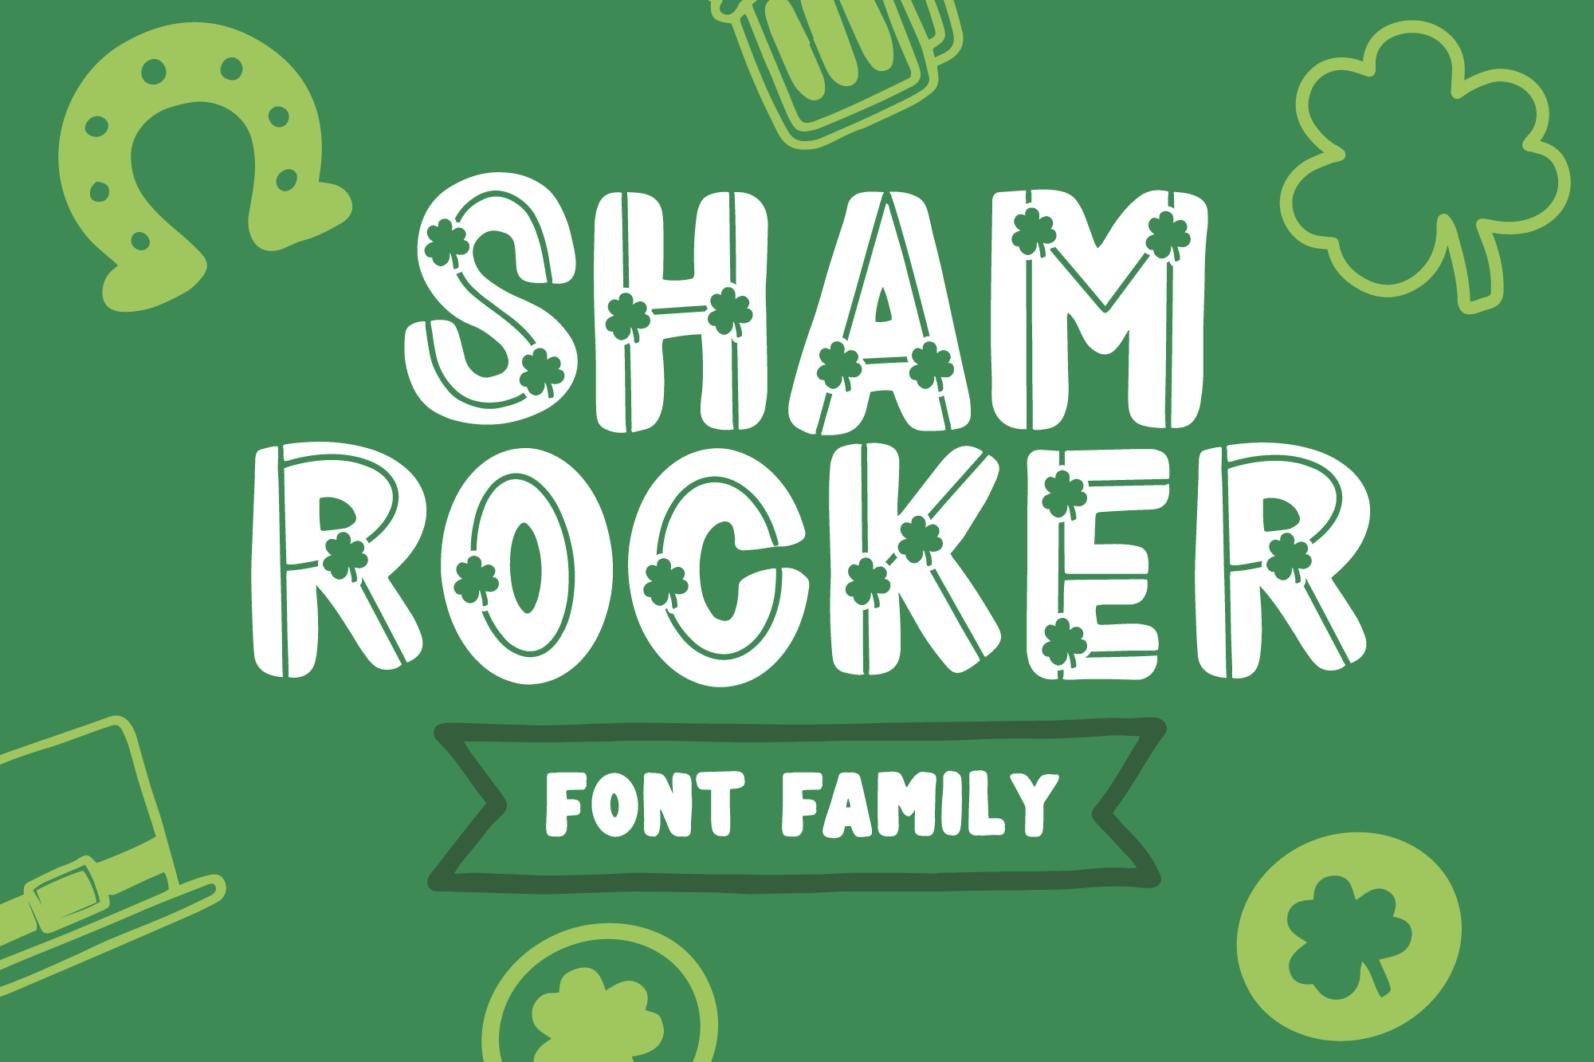 Shamrocker | St. Patrick's Day Font Family - shamrocker display1 -